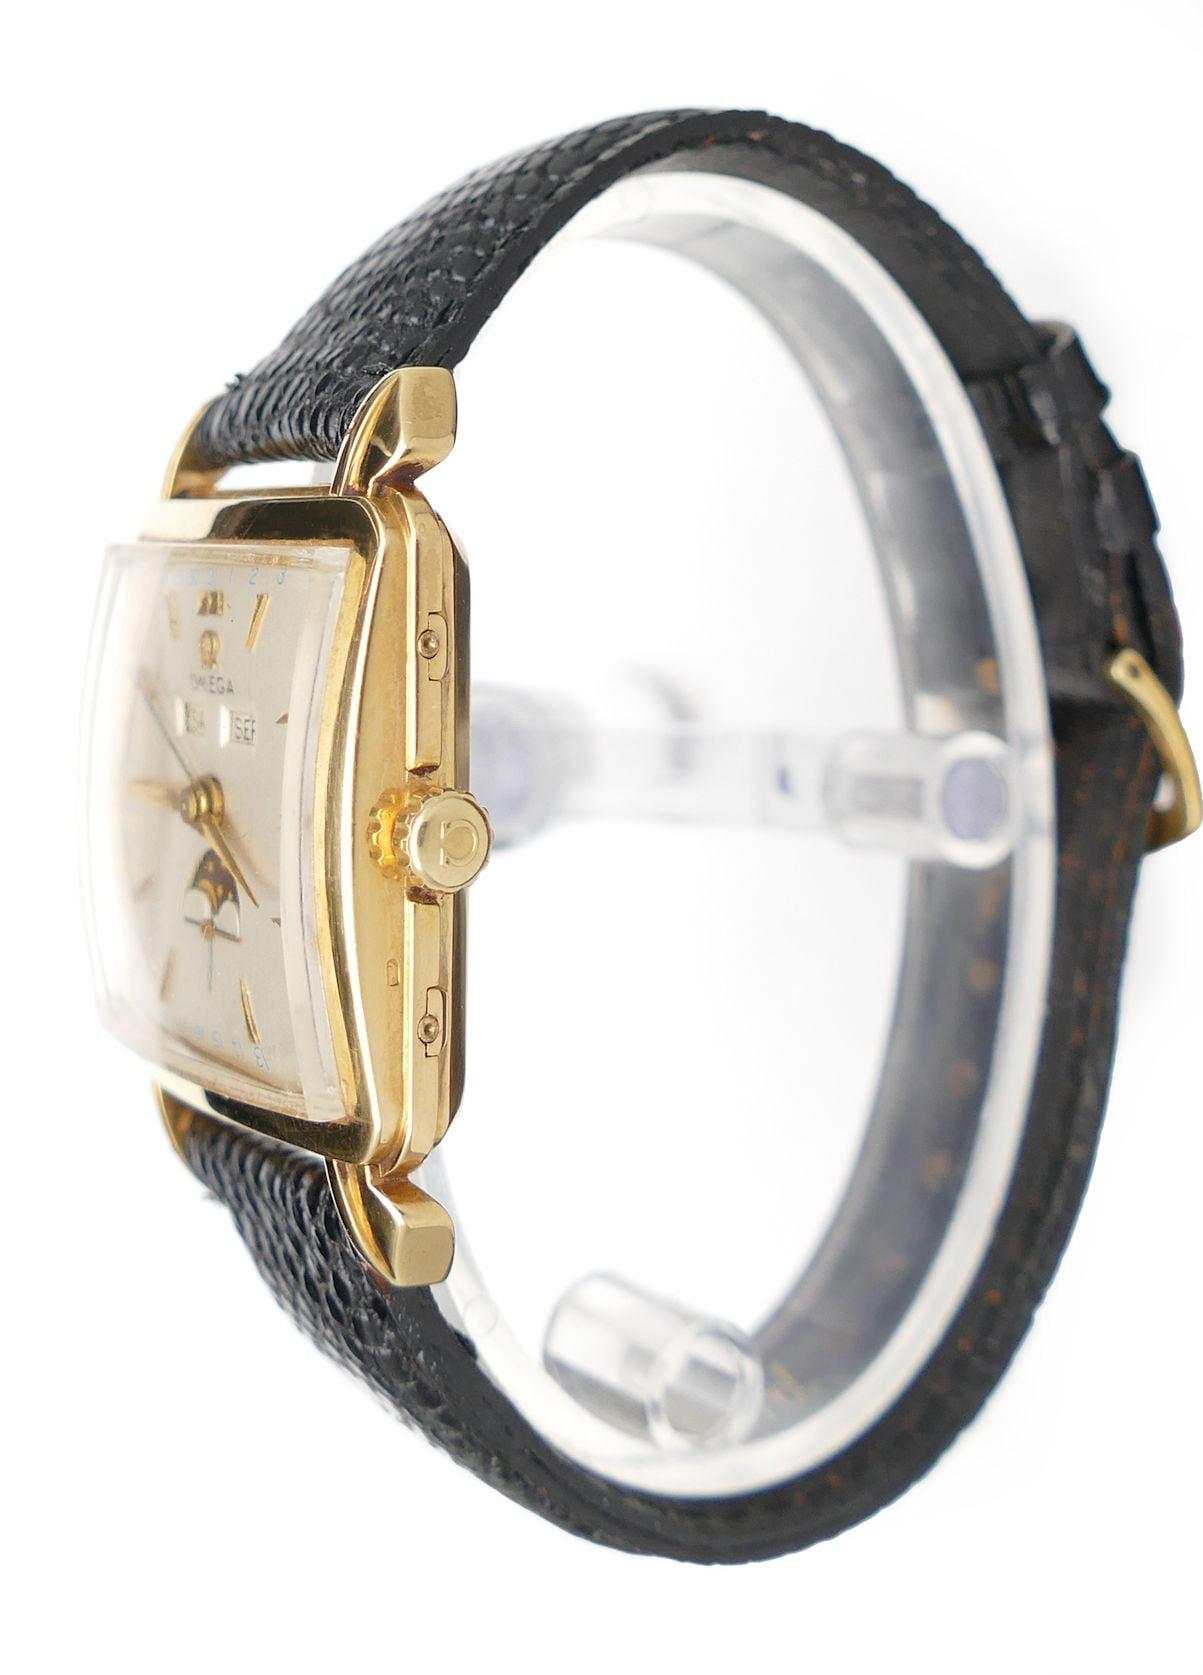 Omega Cosmic Moonphase 3944 Solid 18K Gold Watch - Farfo.com